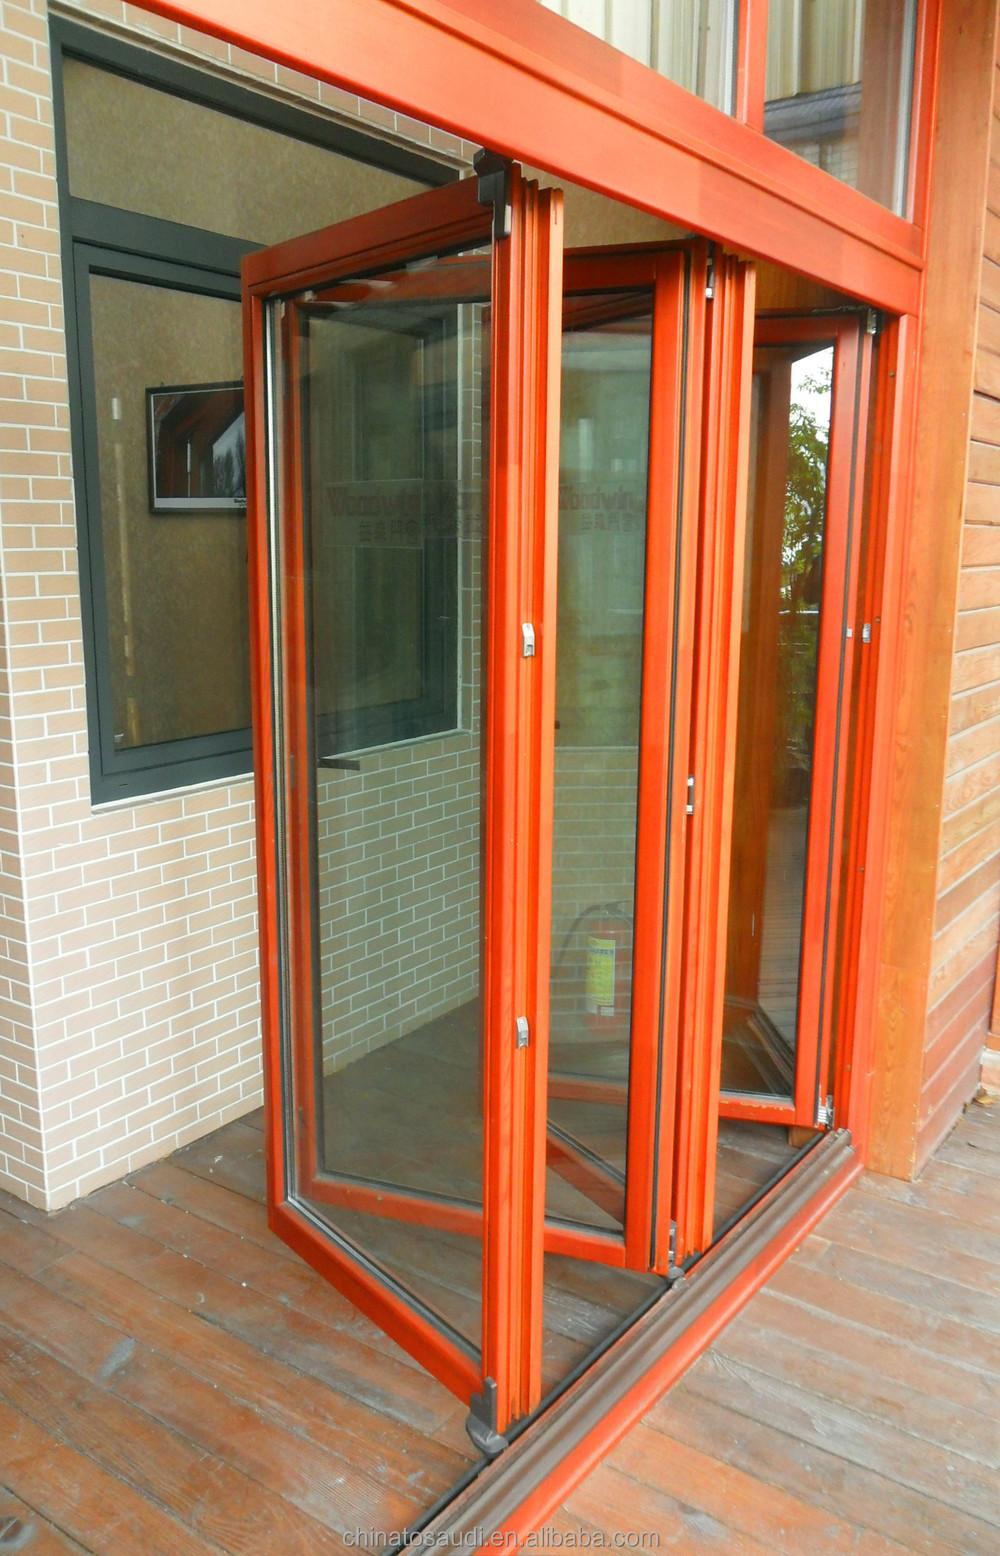 Folding Doors Product : Customized pvc bifold door wooden folding upvc